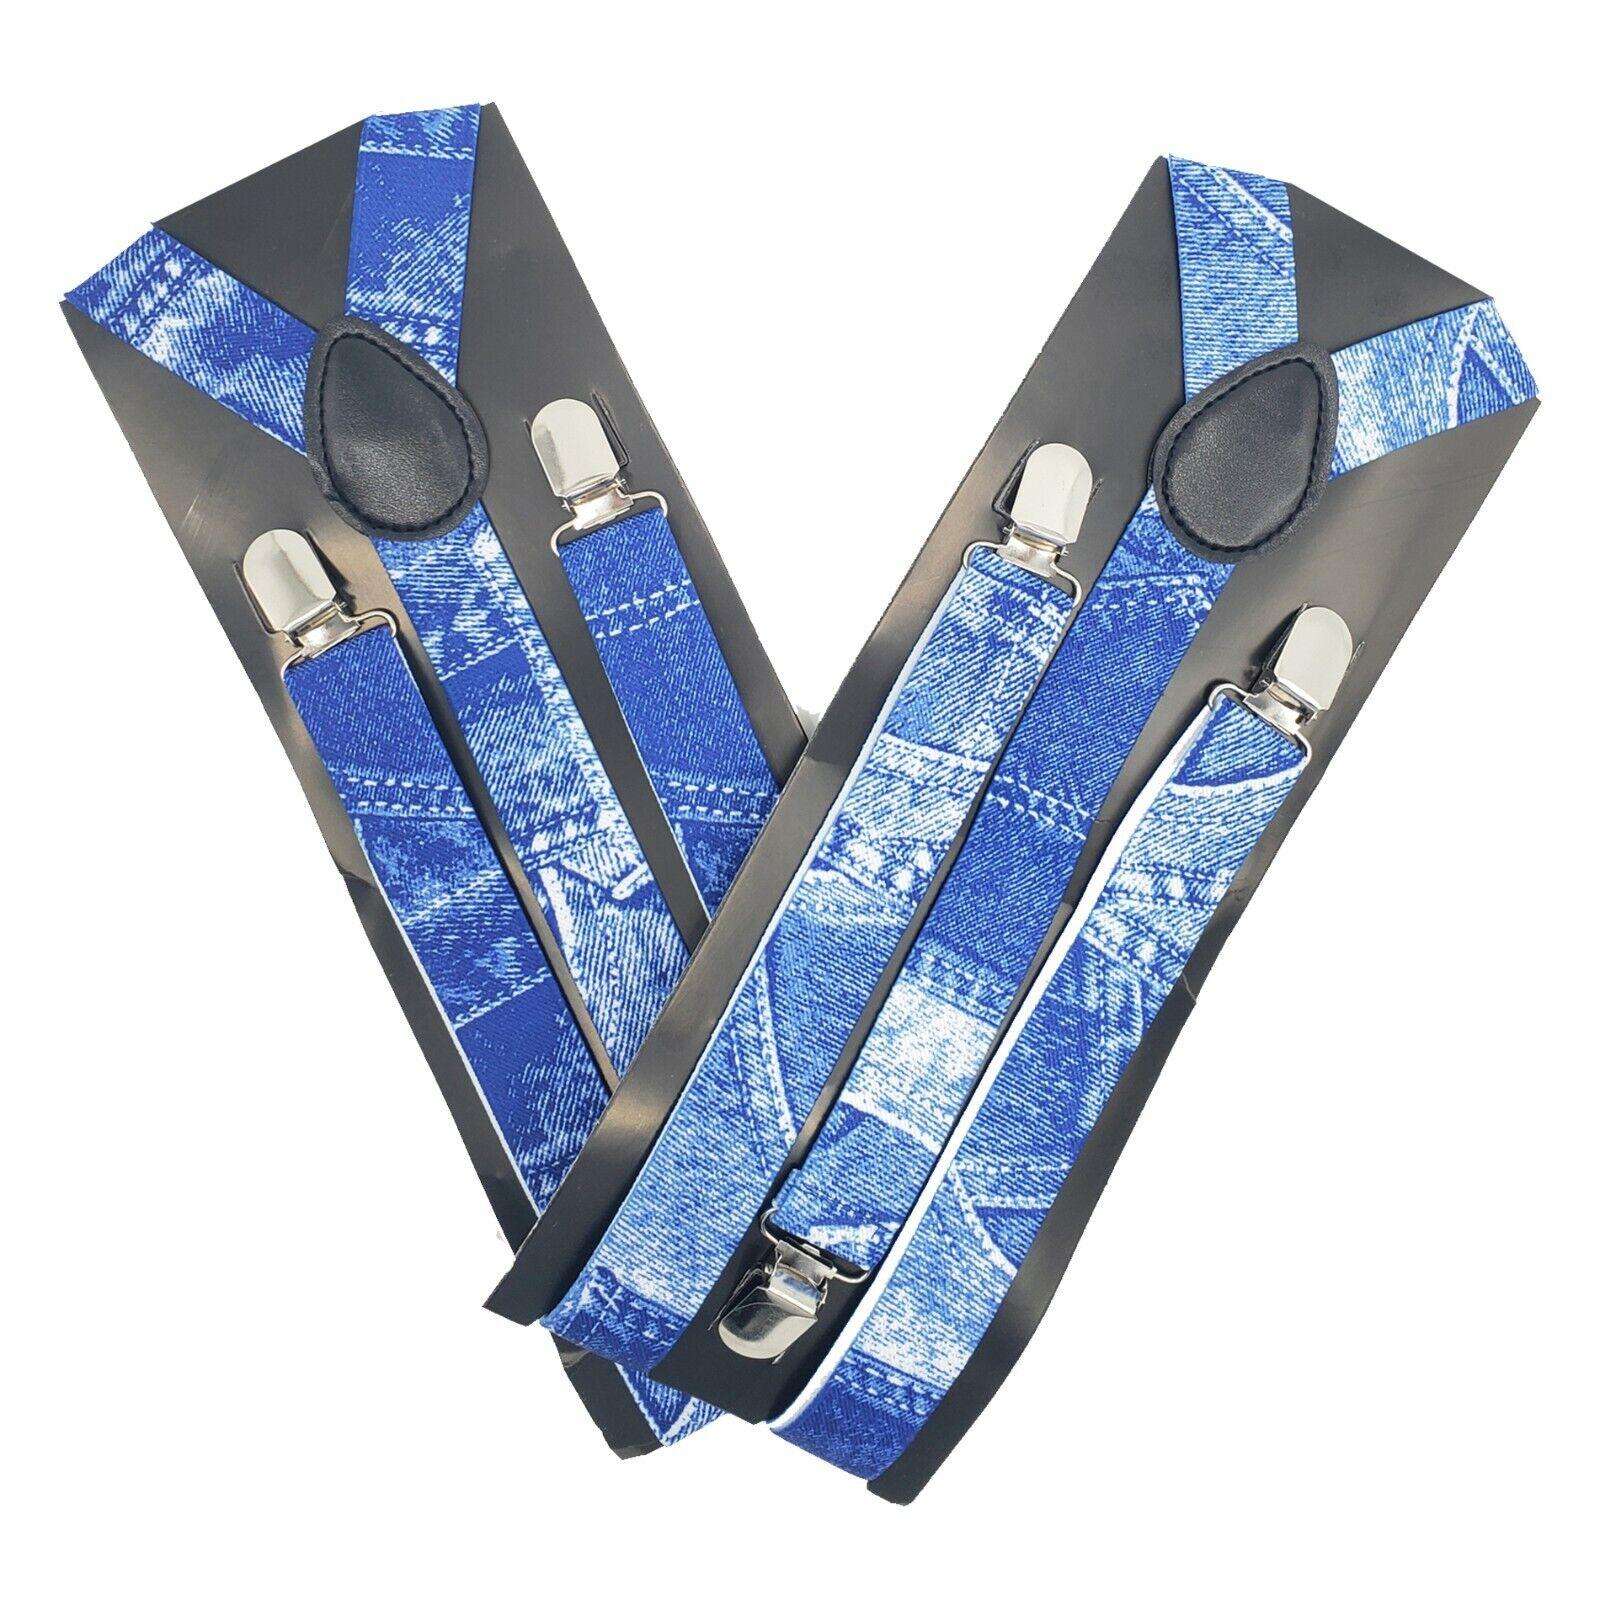 2 Pack Suspenders Adjustable Elastic Y Back Style w/Metal Clips for Men & Women